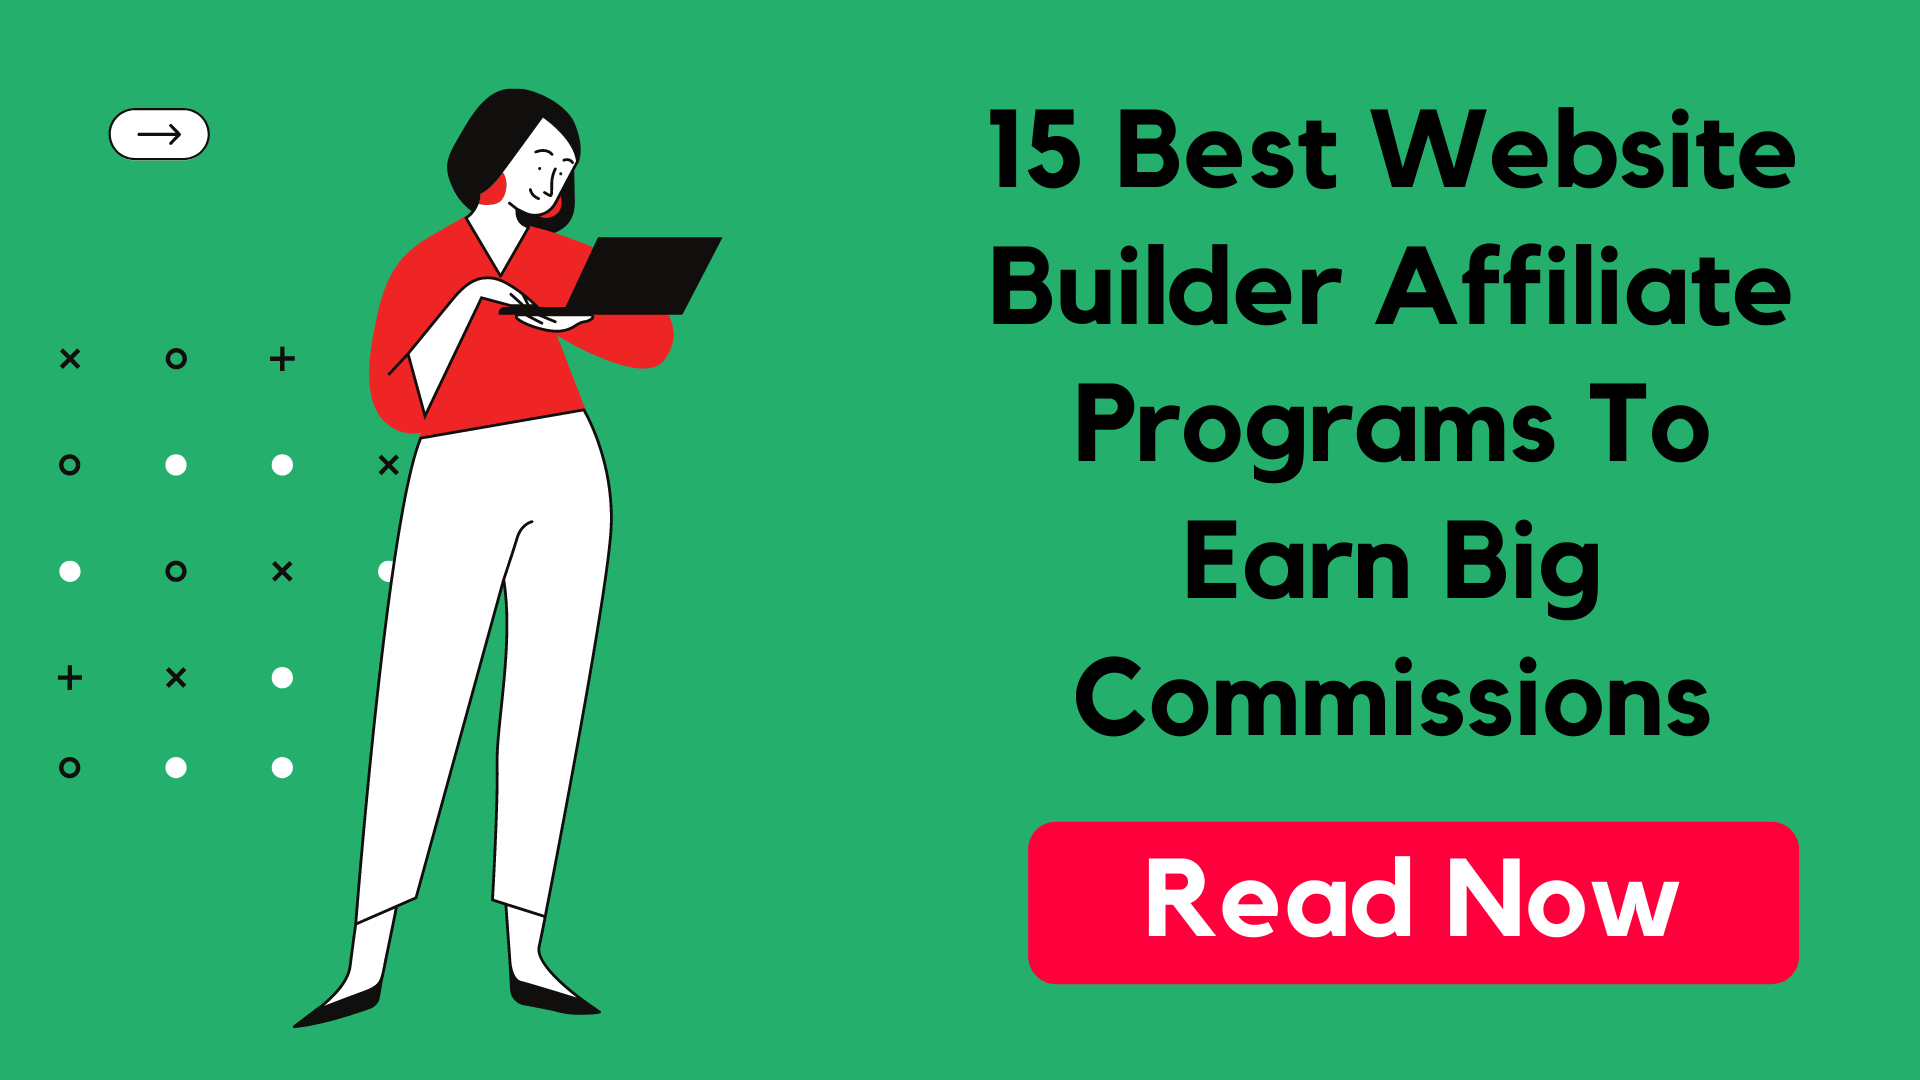 12 Best Website Builder Affiliate Programs